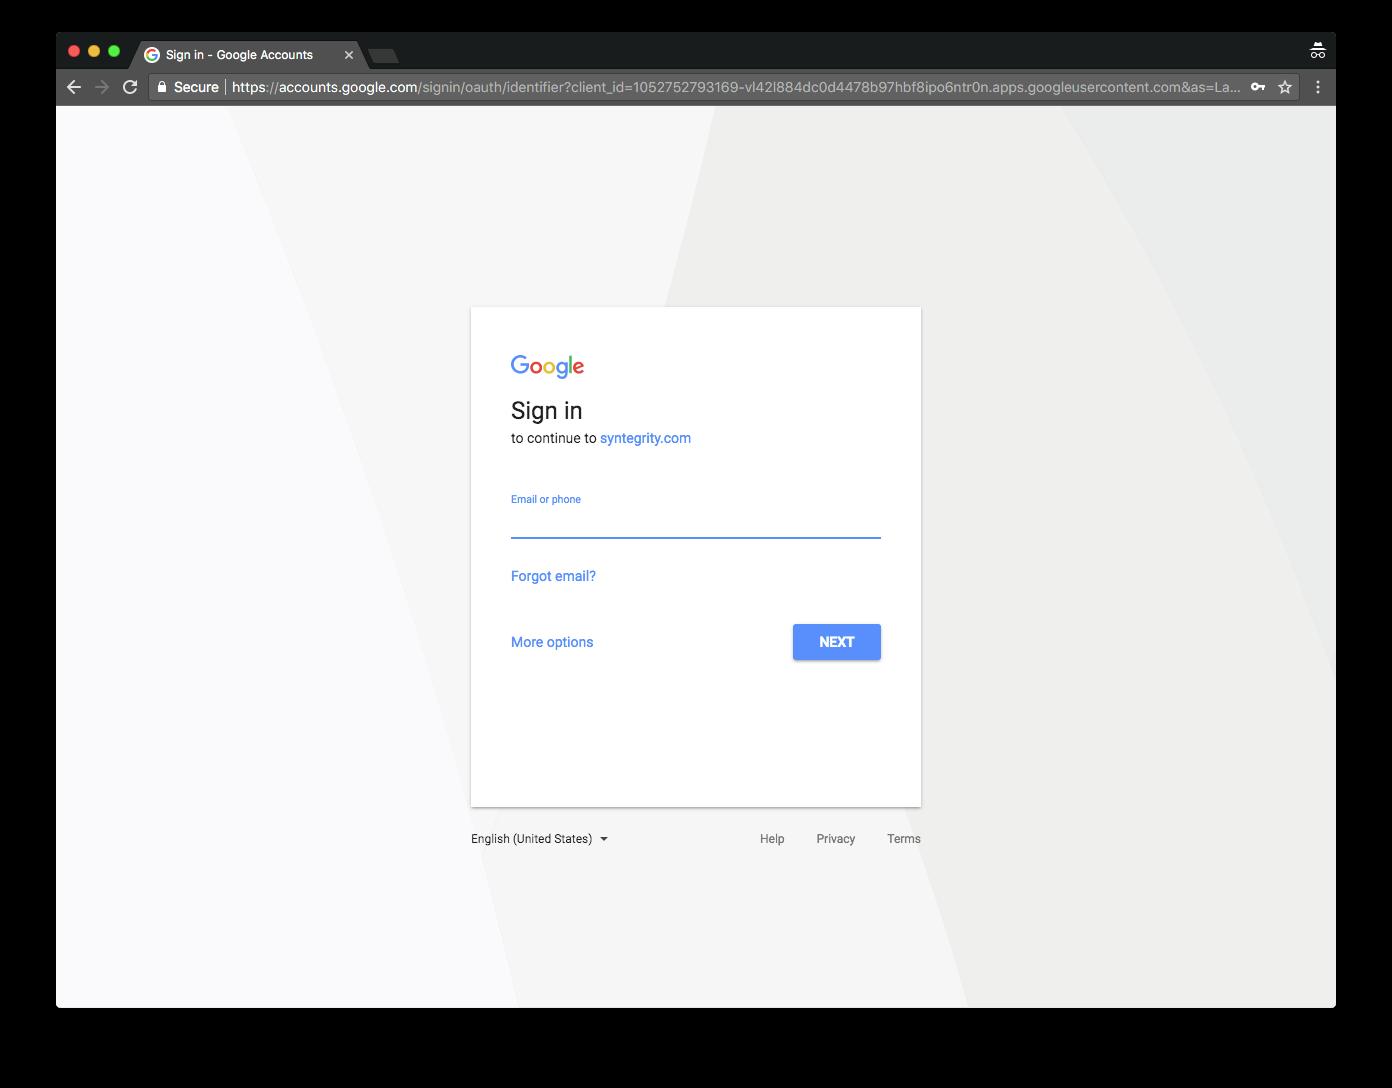 Google Setup